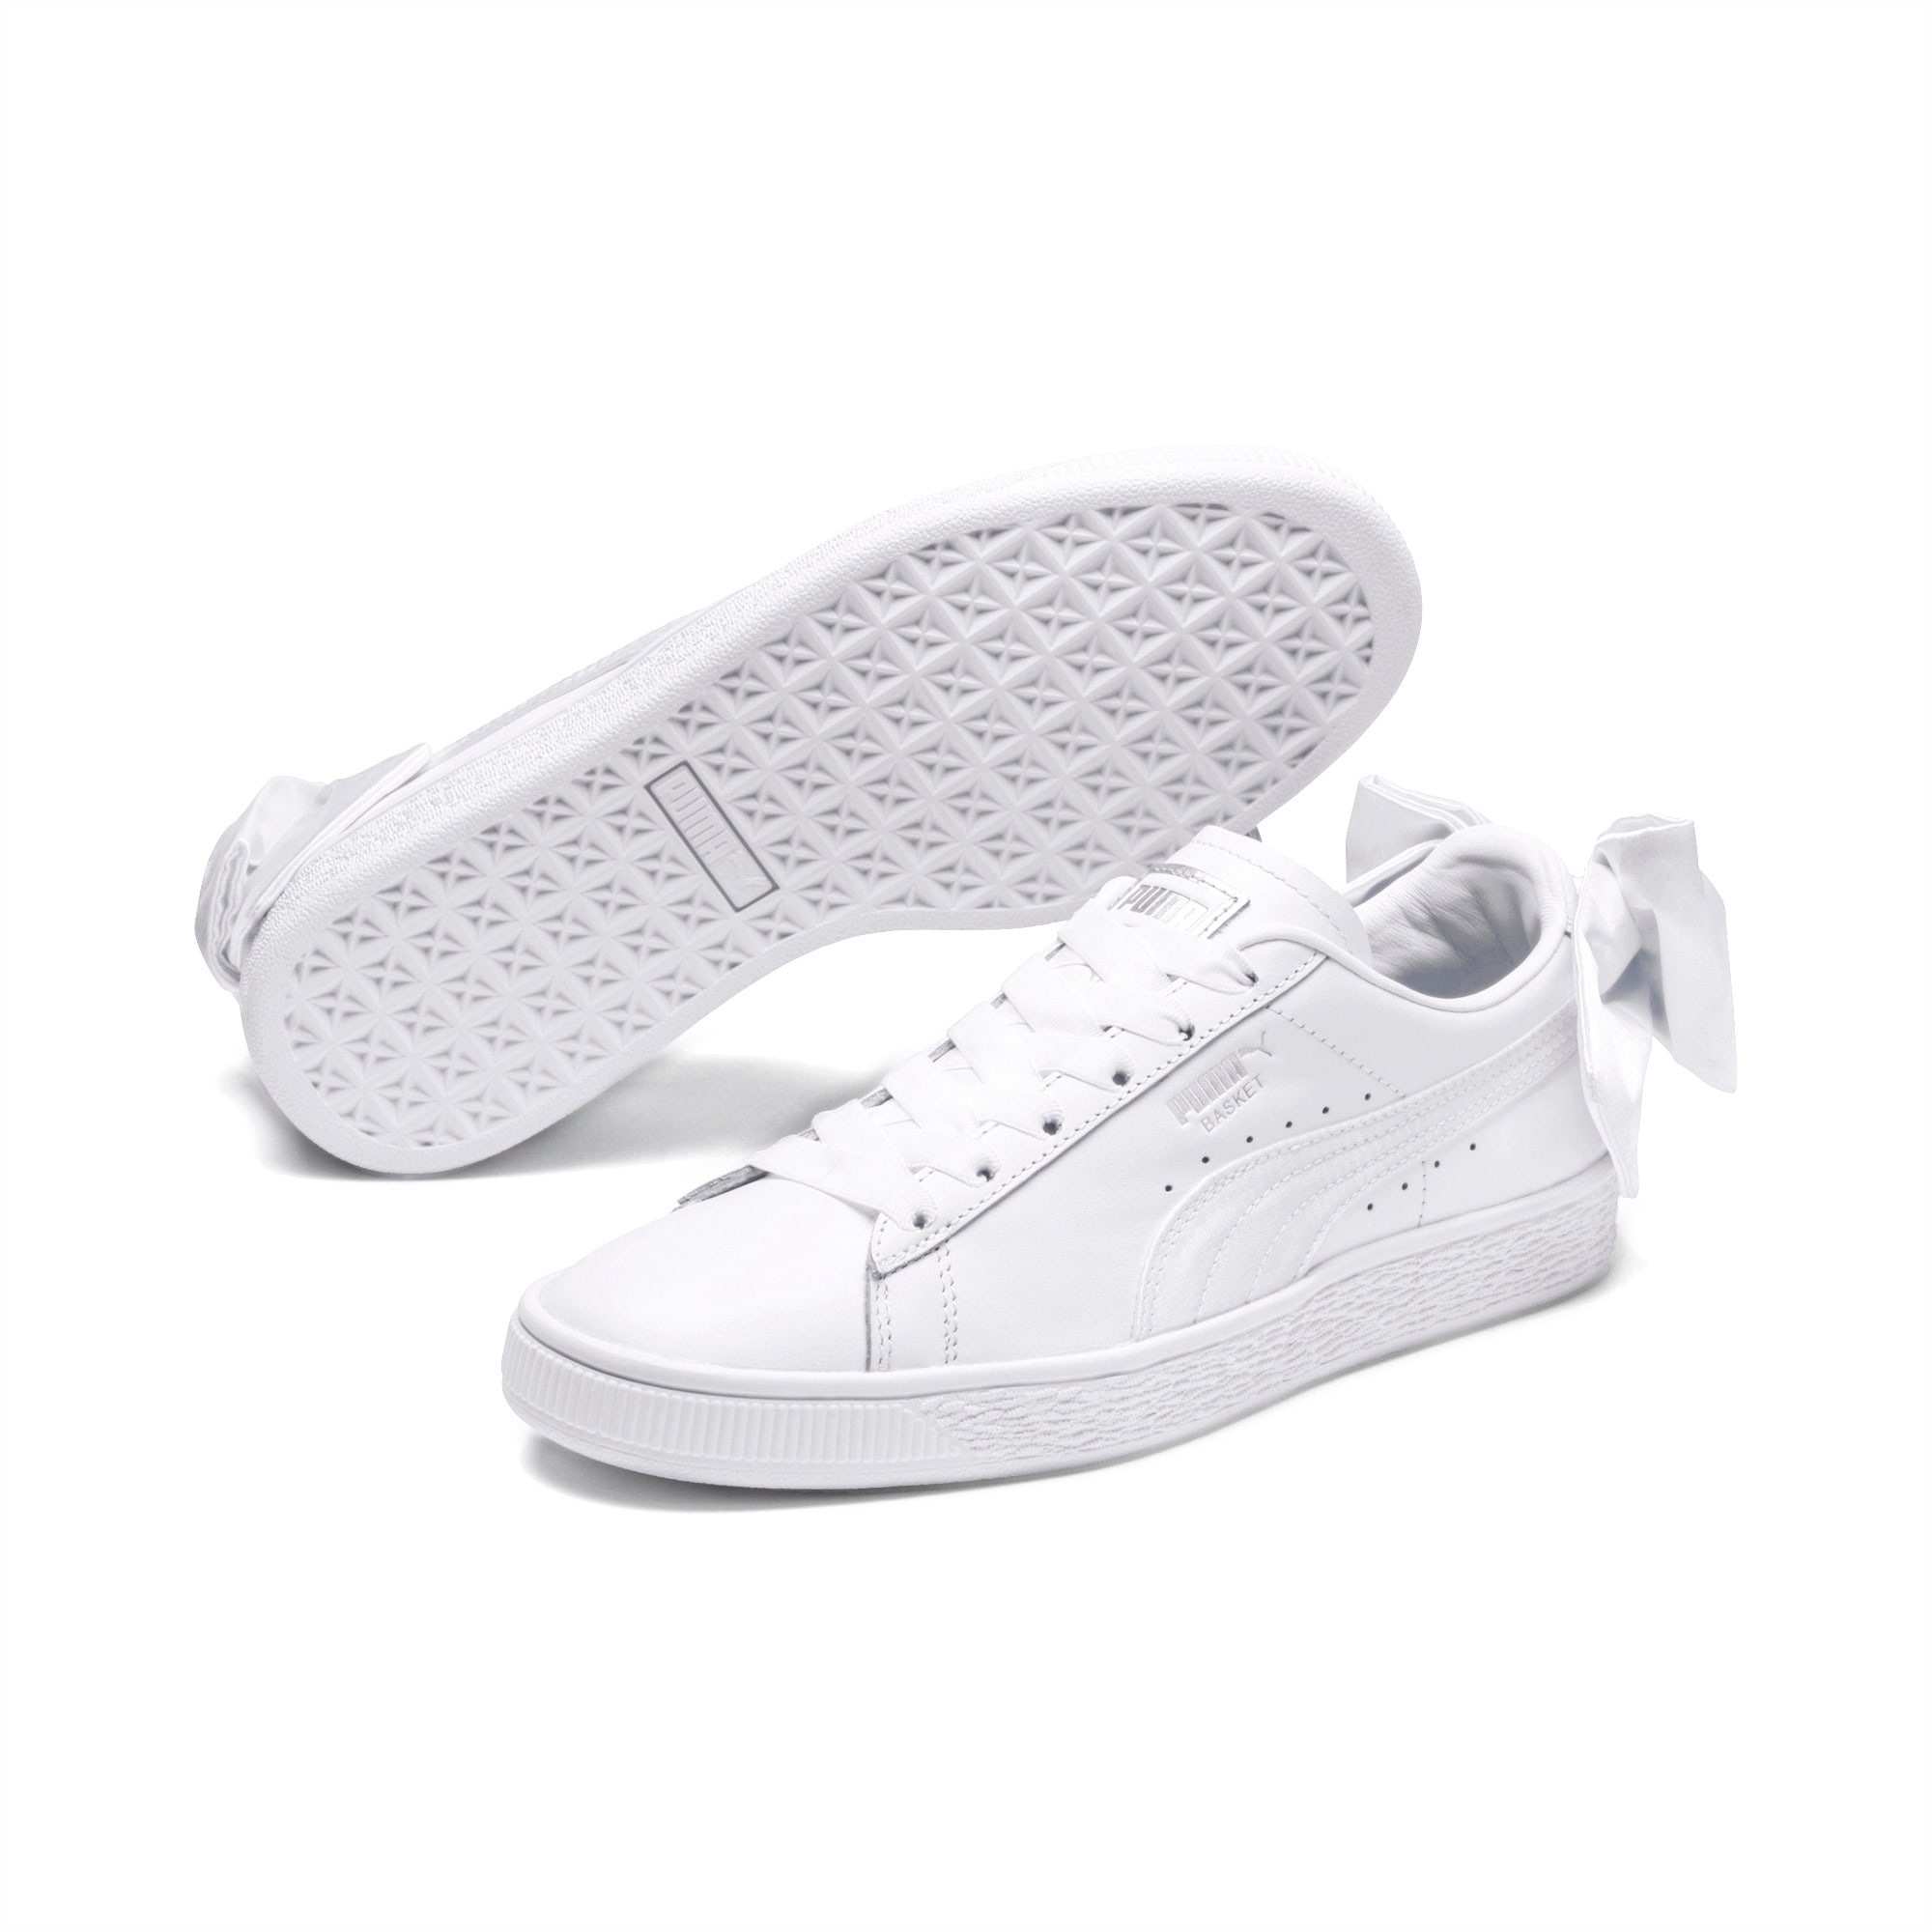 Puma Basket Bow Sneaker Schuhe Damen Schleife Weiß 367319 01